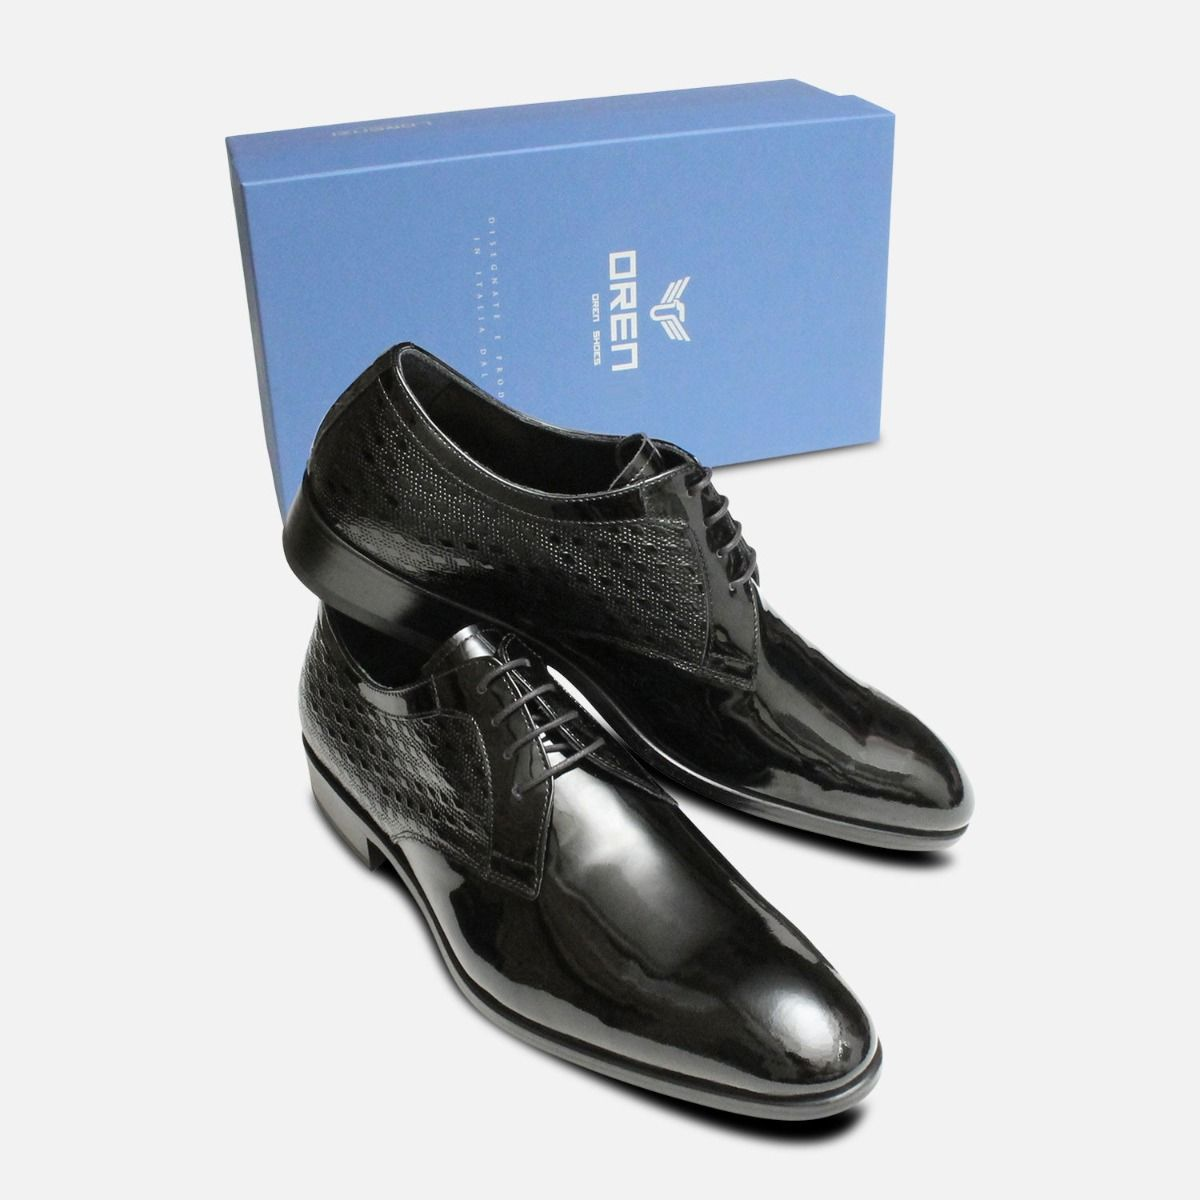 Italian Luxury Black Patent Leather Dress Shoes